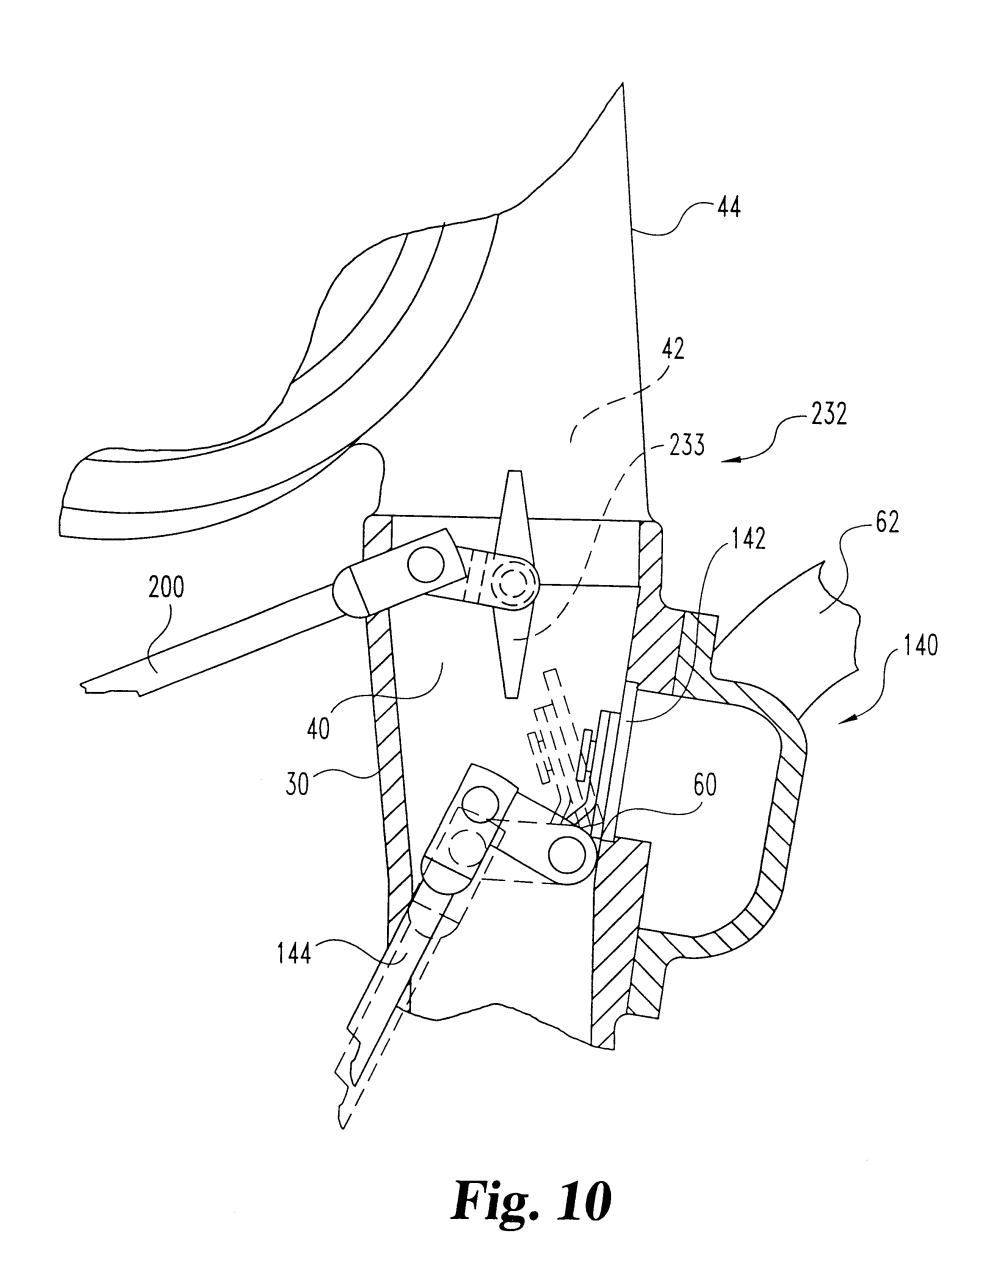 medium resolution of 2004 gmc sierra junction block and relay diagram routenew mx tl wiring diagram gmc sierra 2004 http wwwfilemountcom 2009 03 2004